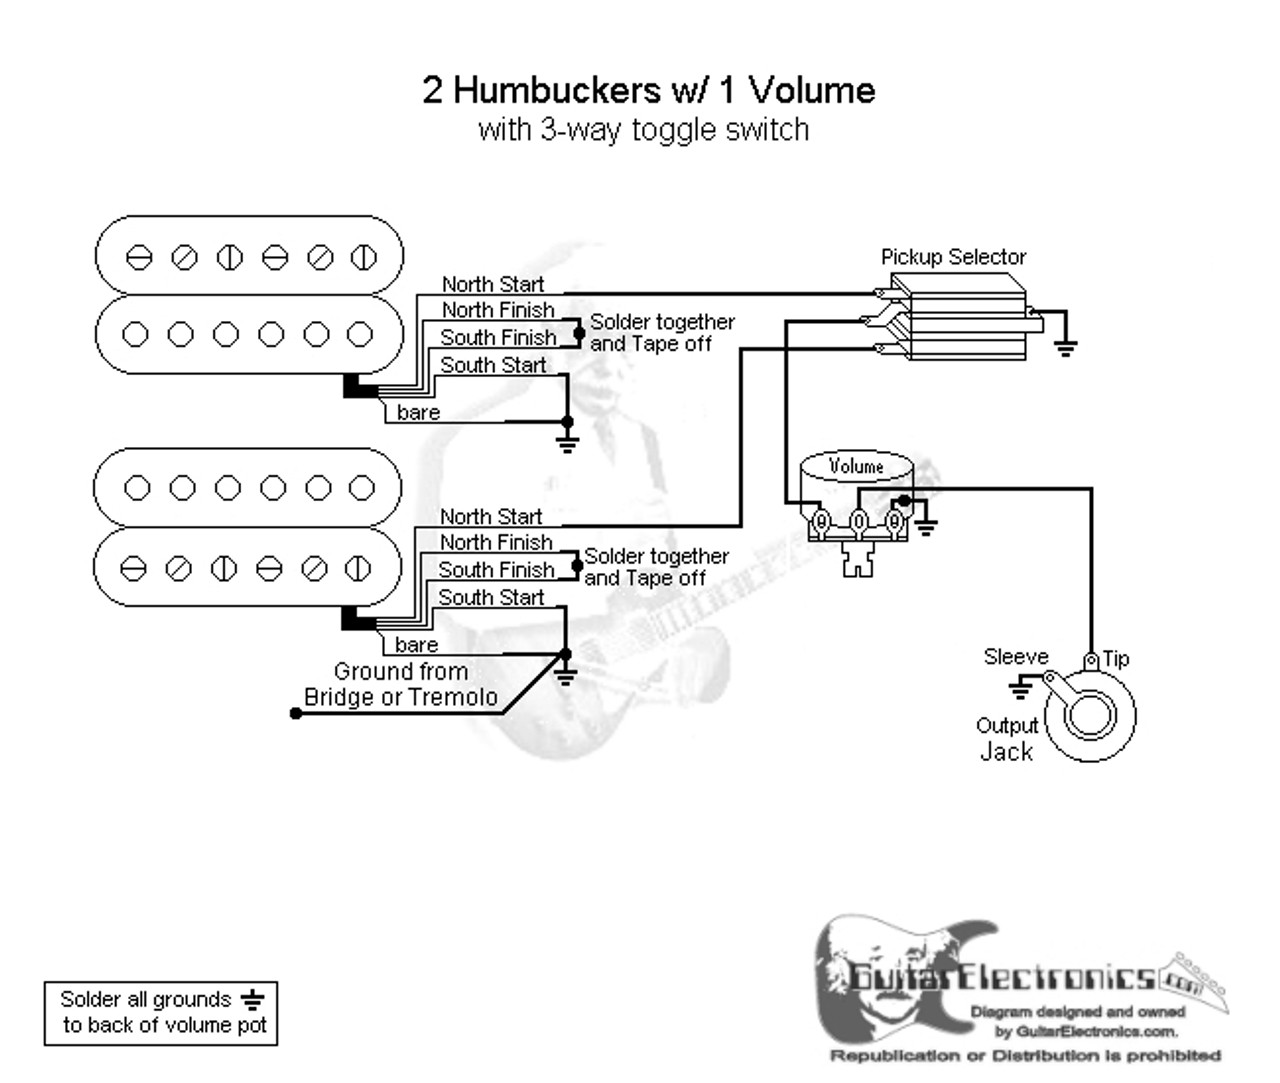 hight resolution of 2 humbuckers 3 way toggle switch 1 volume 2 pickup guitar wiring